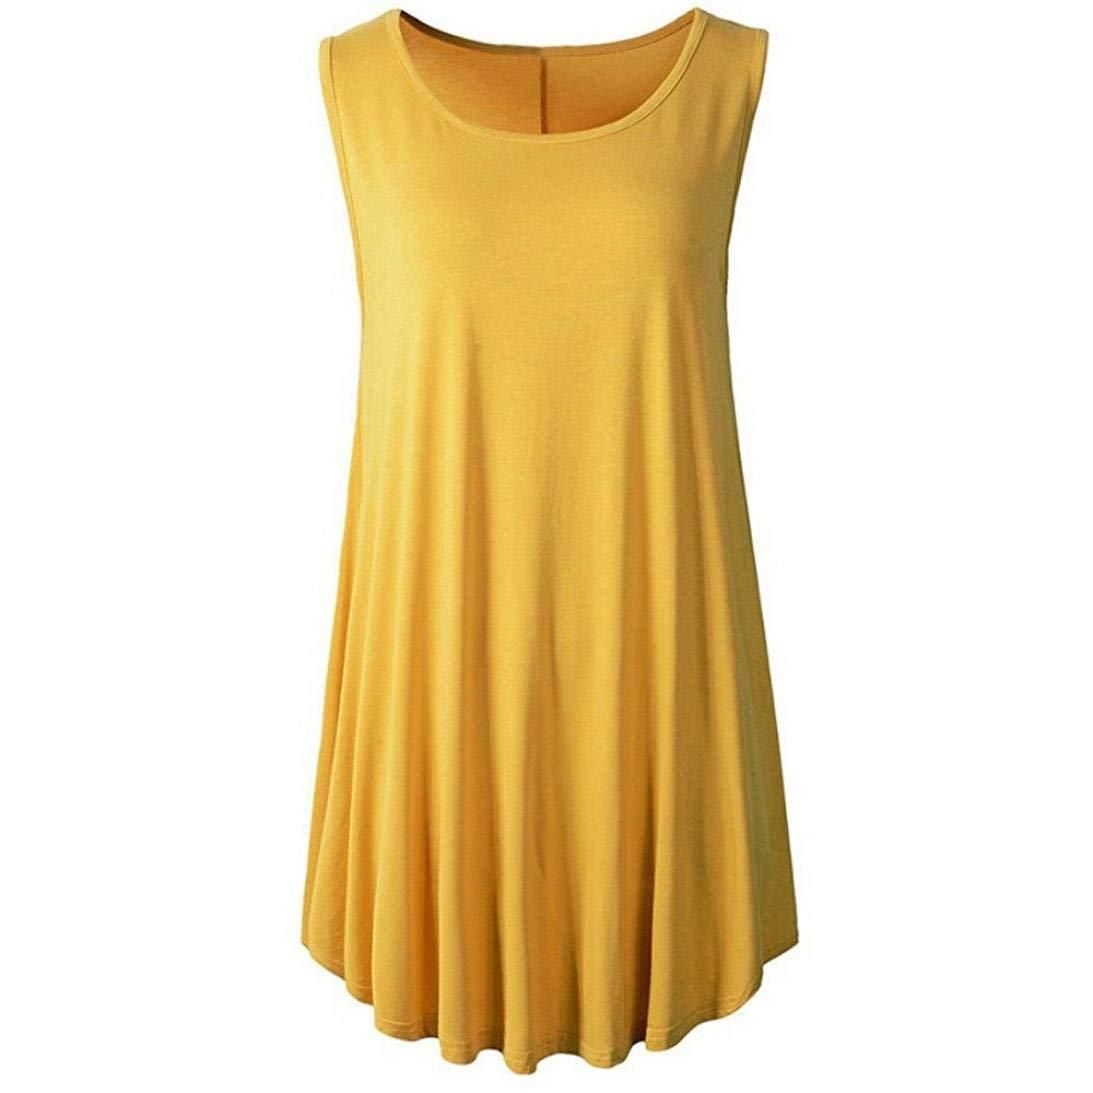 WM & MW Clearance Women Tops Casual Yoga Solid O-Neck Sleeveless Tunic Shirt Swing Vest Tank Top